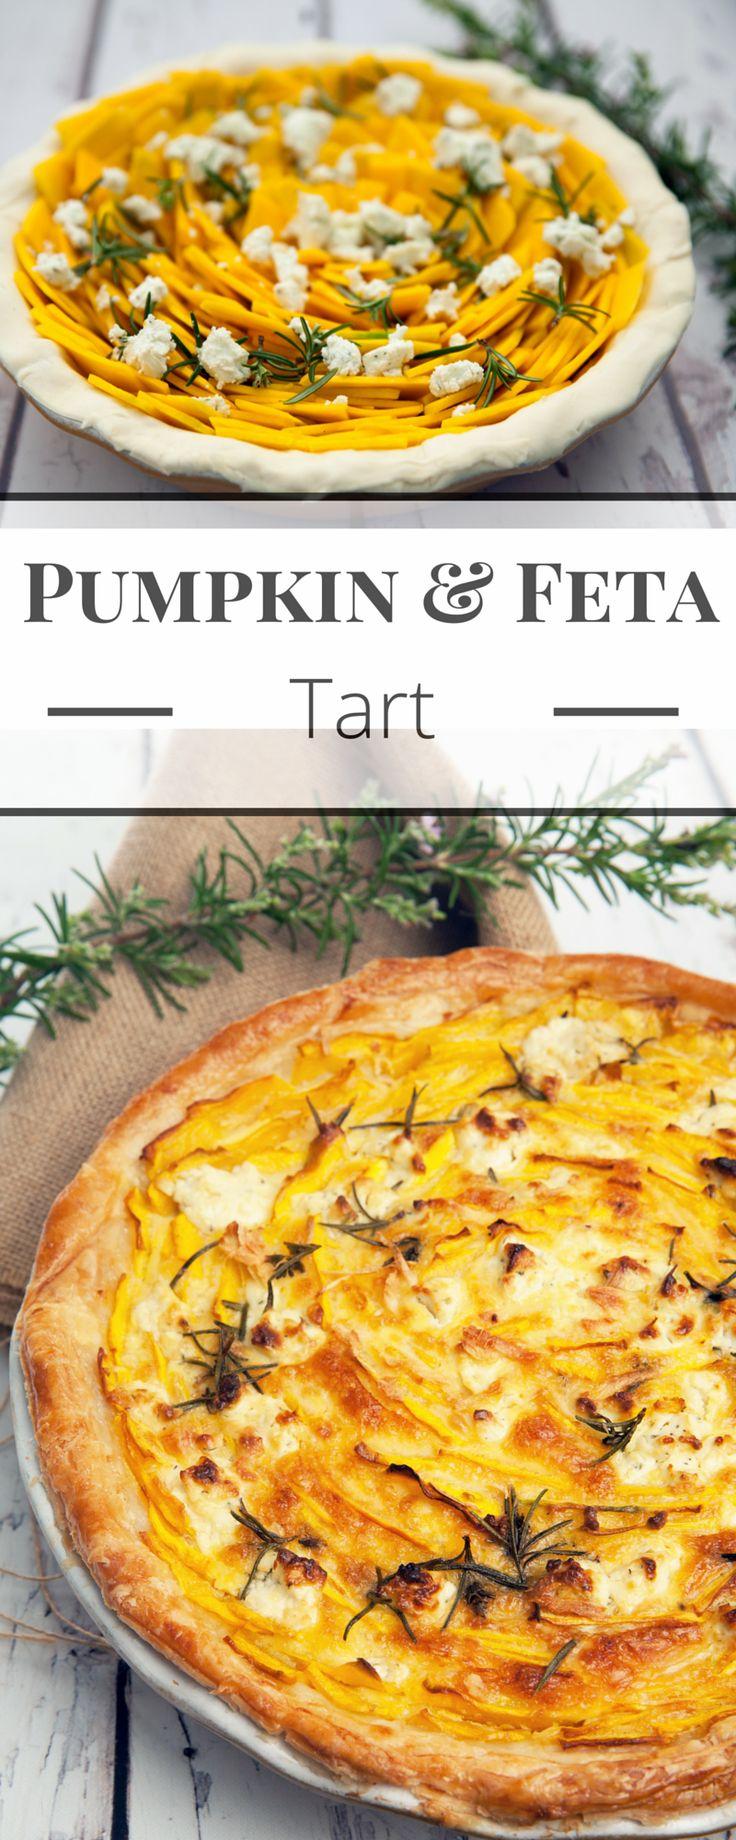 Pumpkin & Feta Tart is a delicious vegetarian pie which would make a fabulous centrepiece.